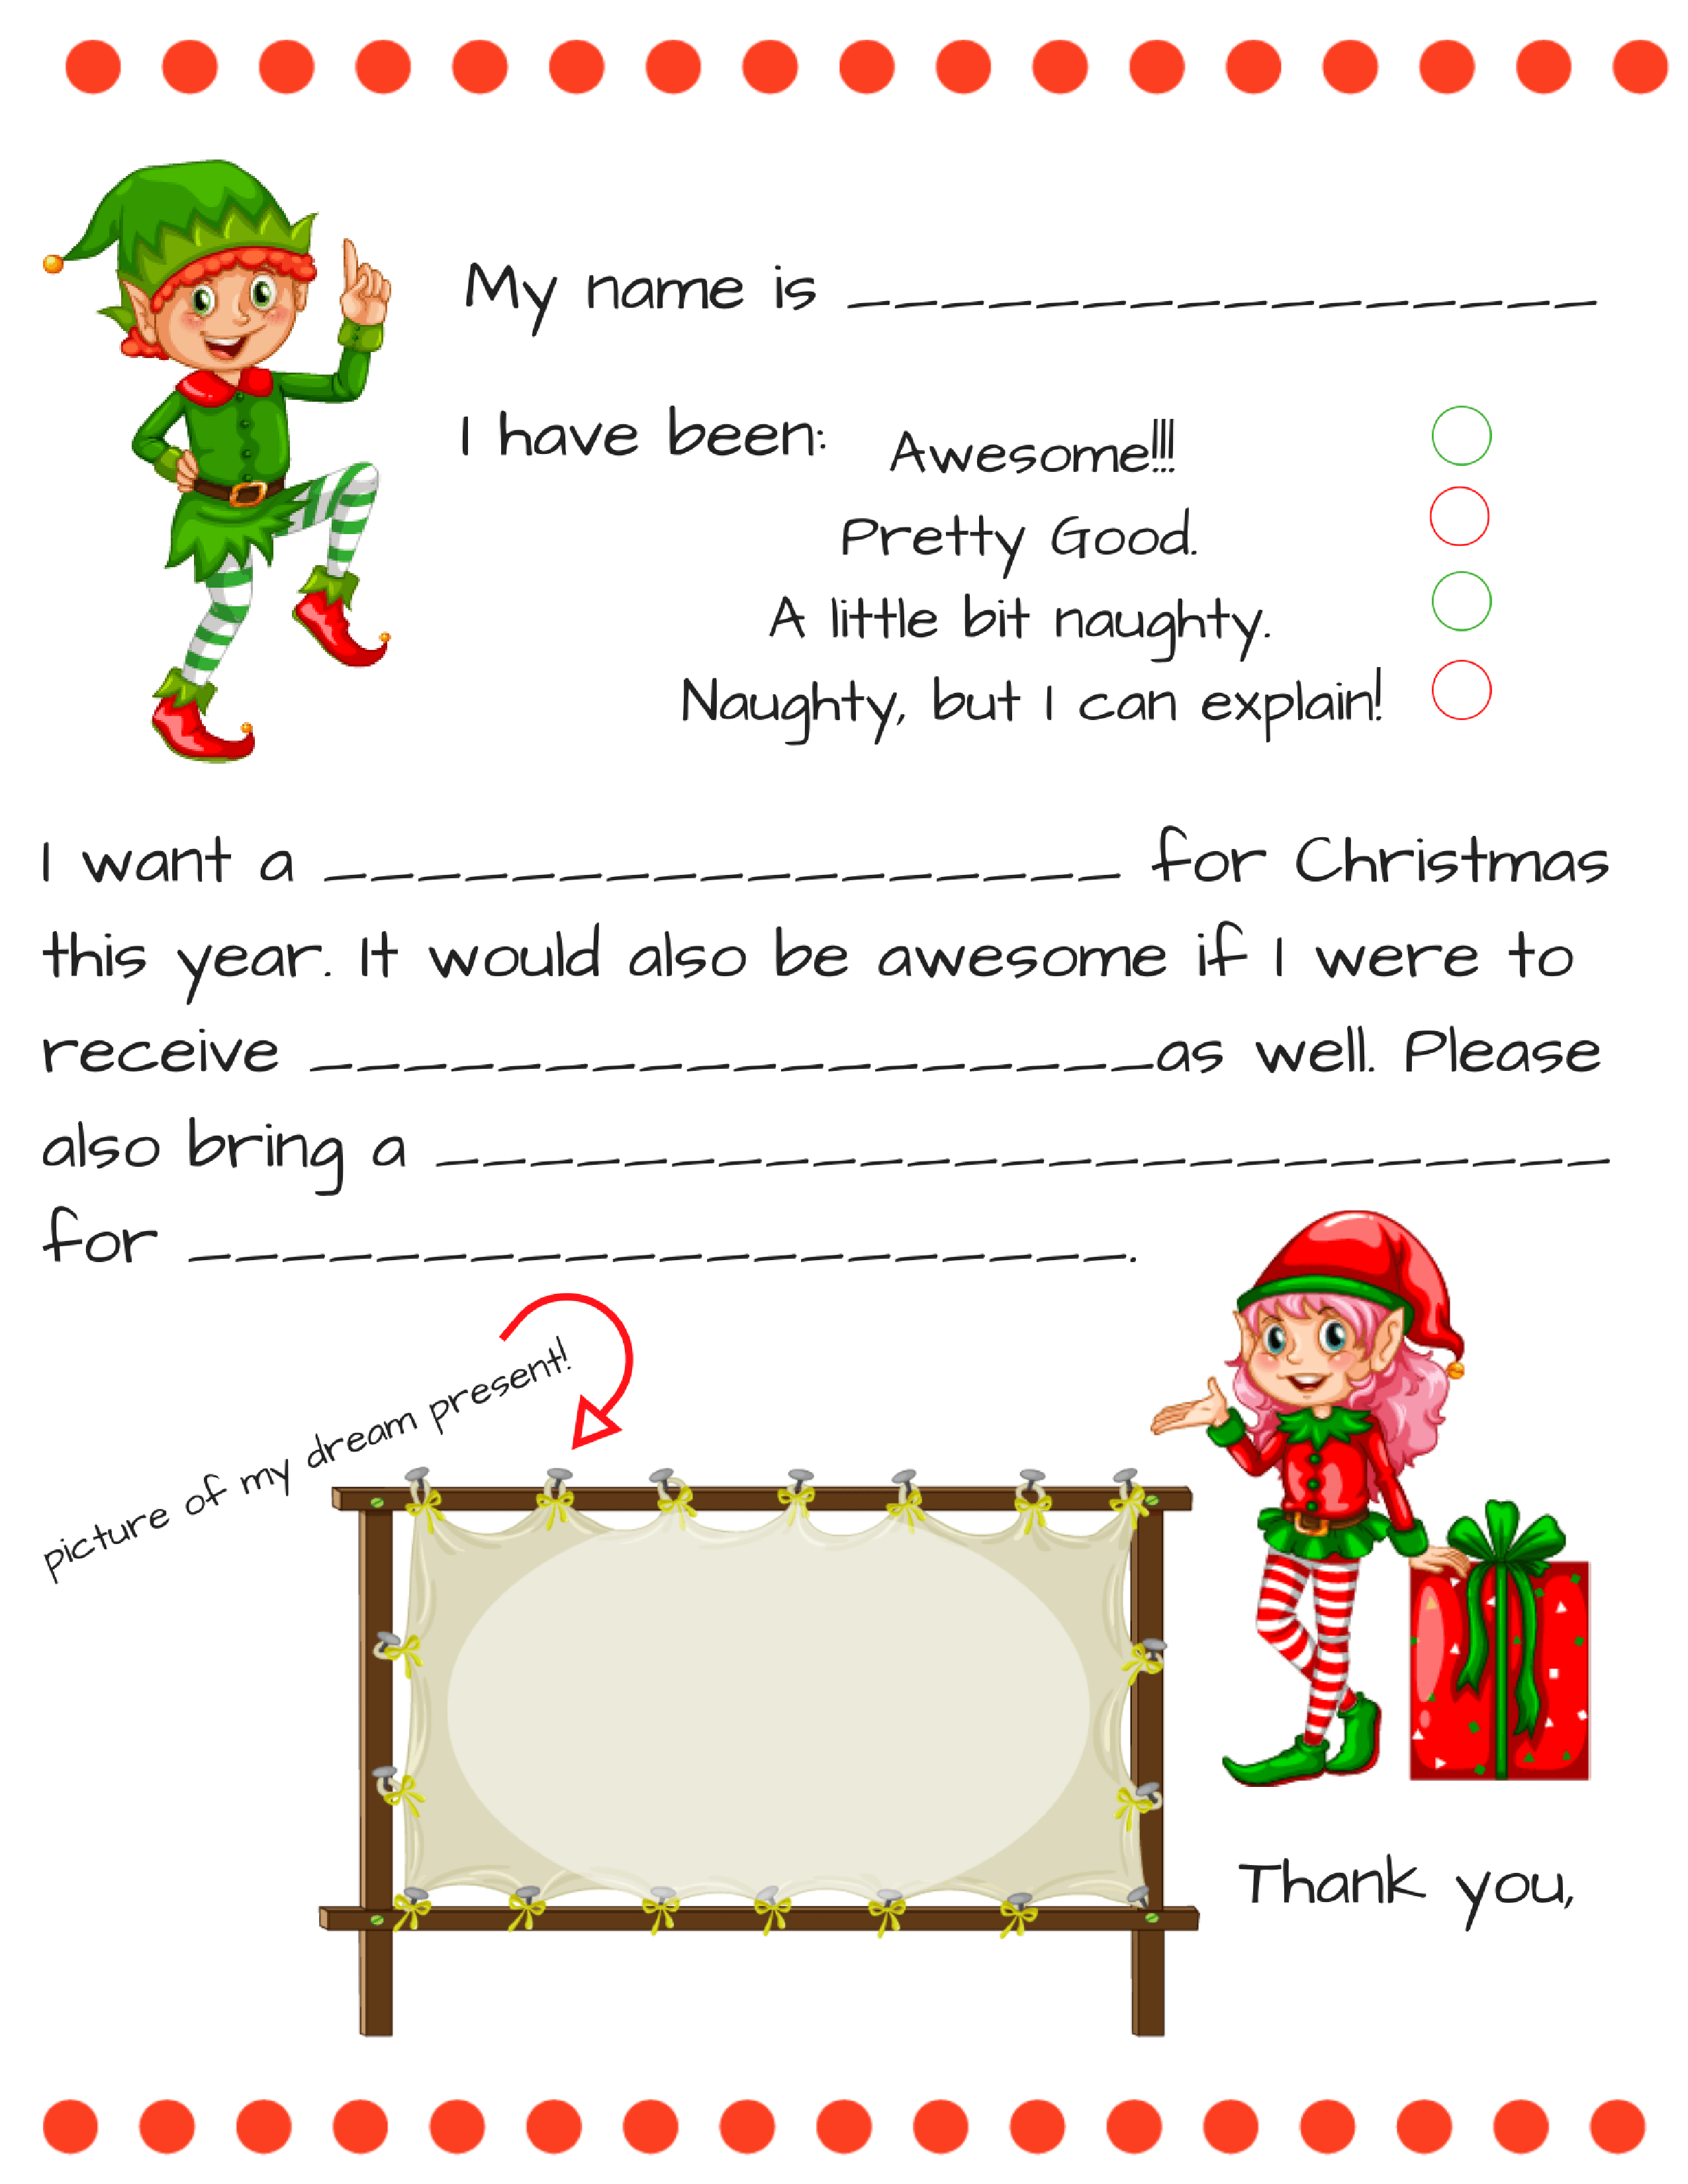 Free Dear Santa letter printable | Fill in blank Santa letter for younger kids plus older child dear Santa template, FREE PRINTABLE